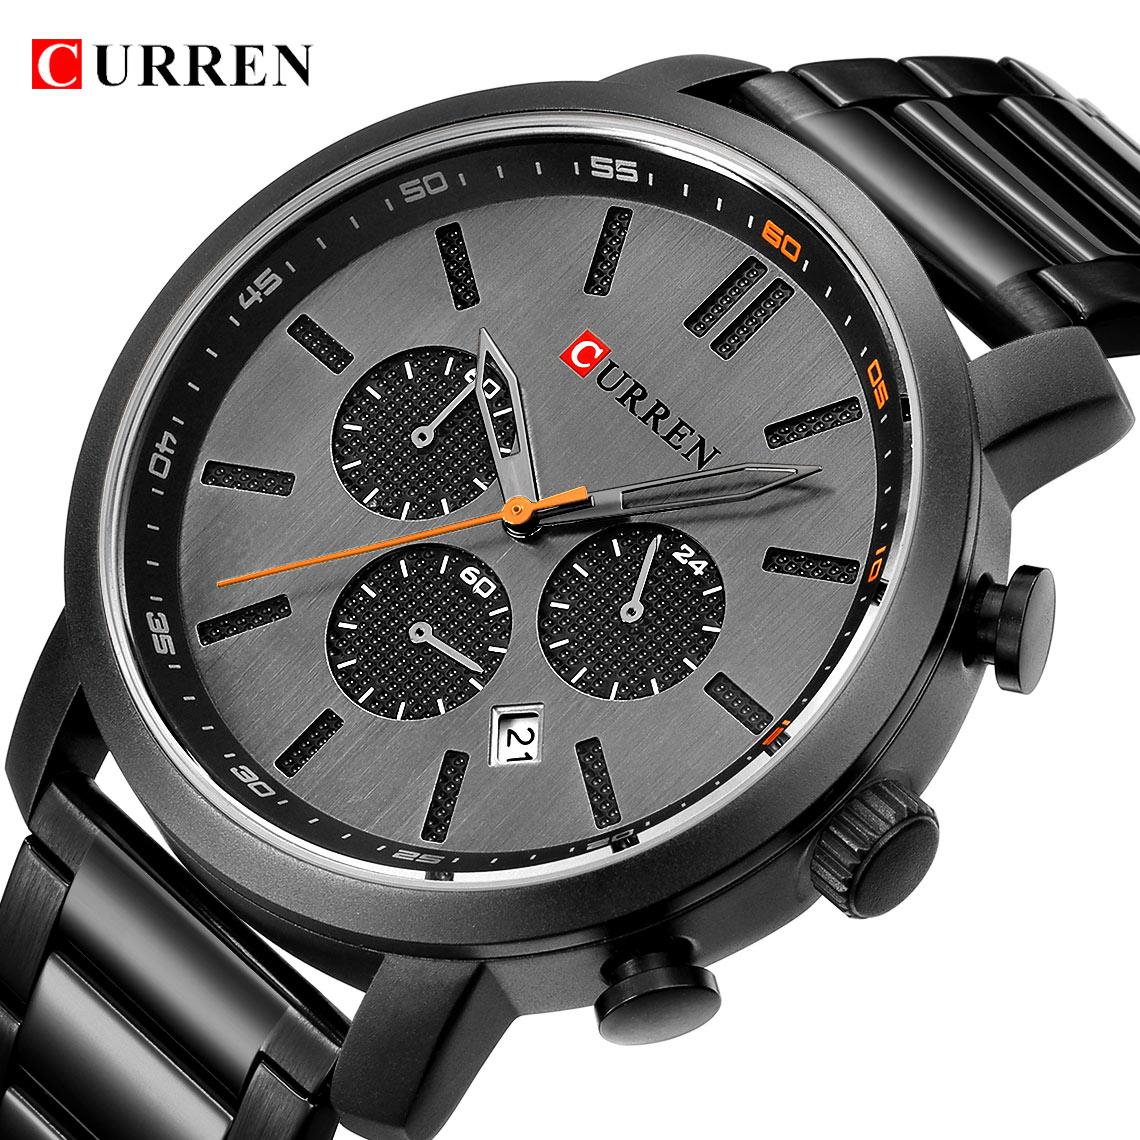 Men Sport Watch CURREN Fashion Brand Men Stainless Steel Quartz Army Military Wrist Watch Waterproof Chronograph Business Watch цена